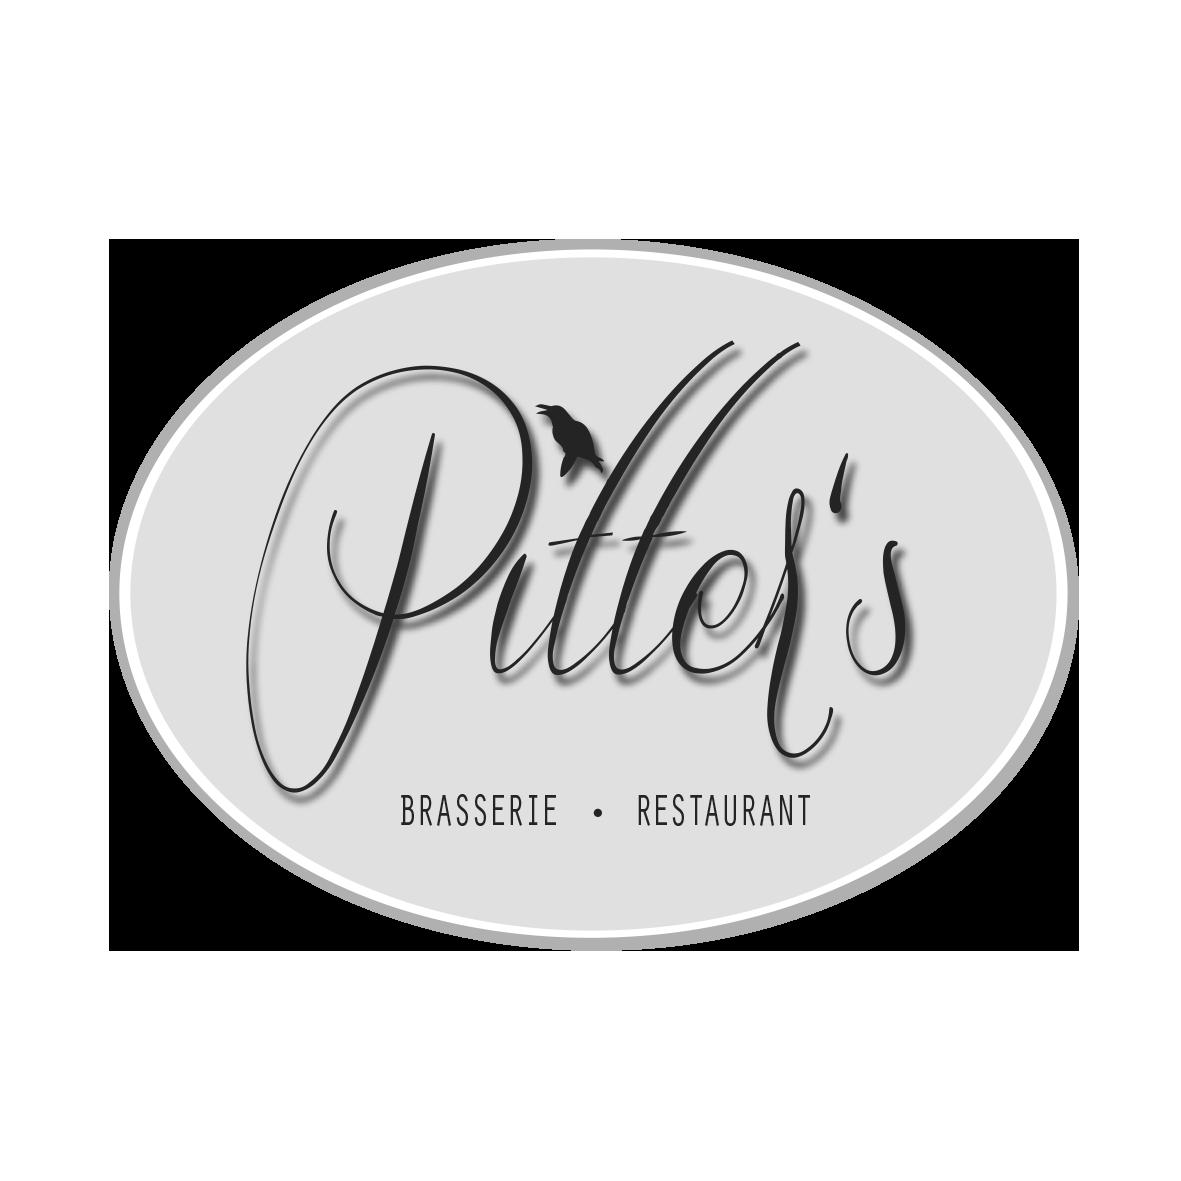 Pitter's